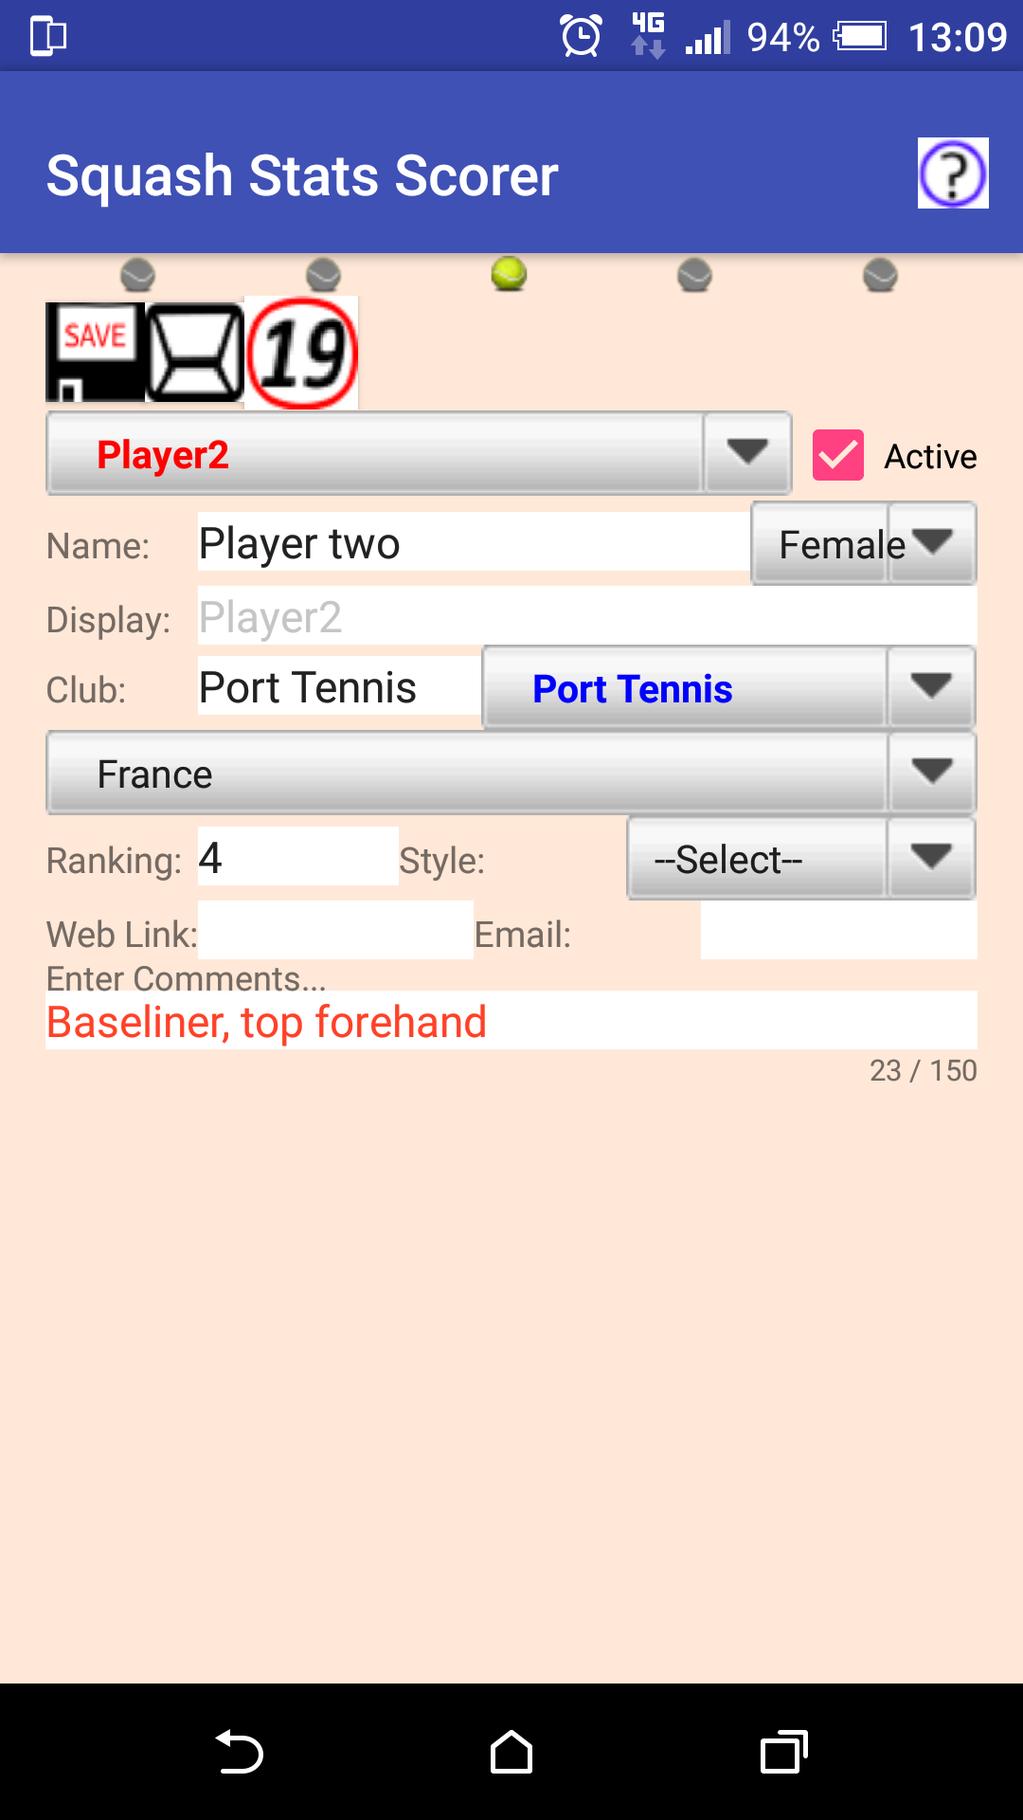 Squash Stats Scorer Screenshot 3